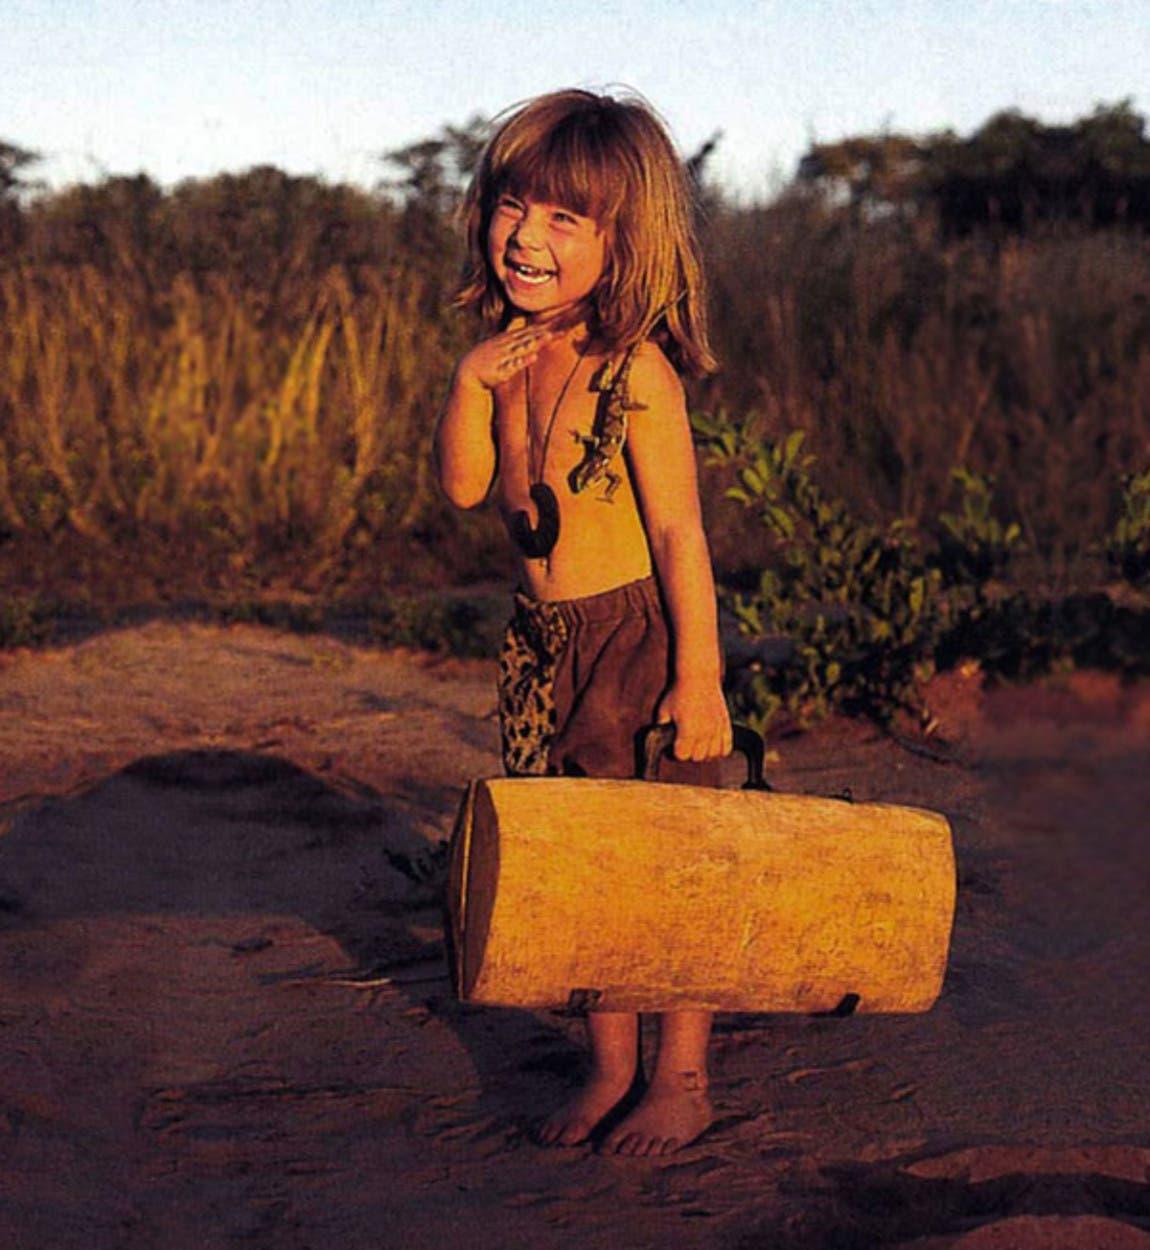 little-lizard-girl-tippi-africa-pic-photo